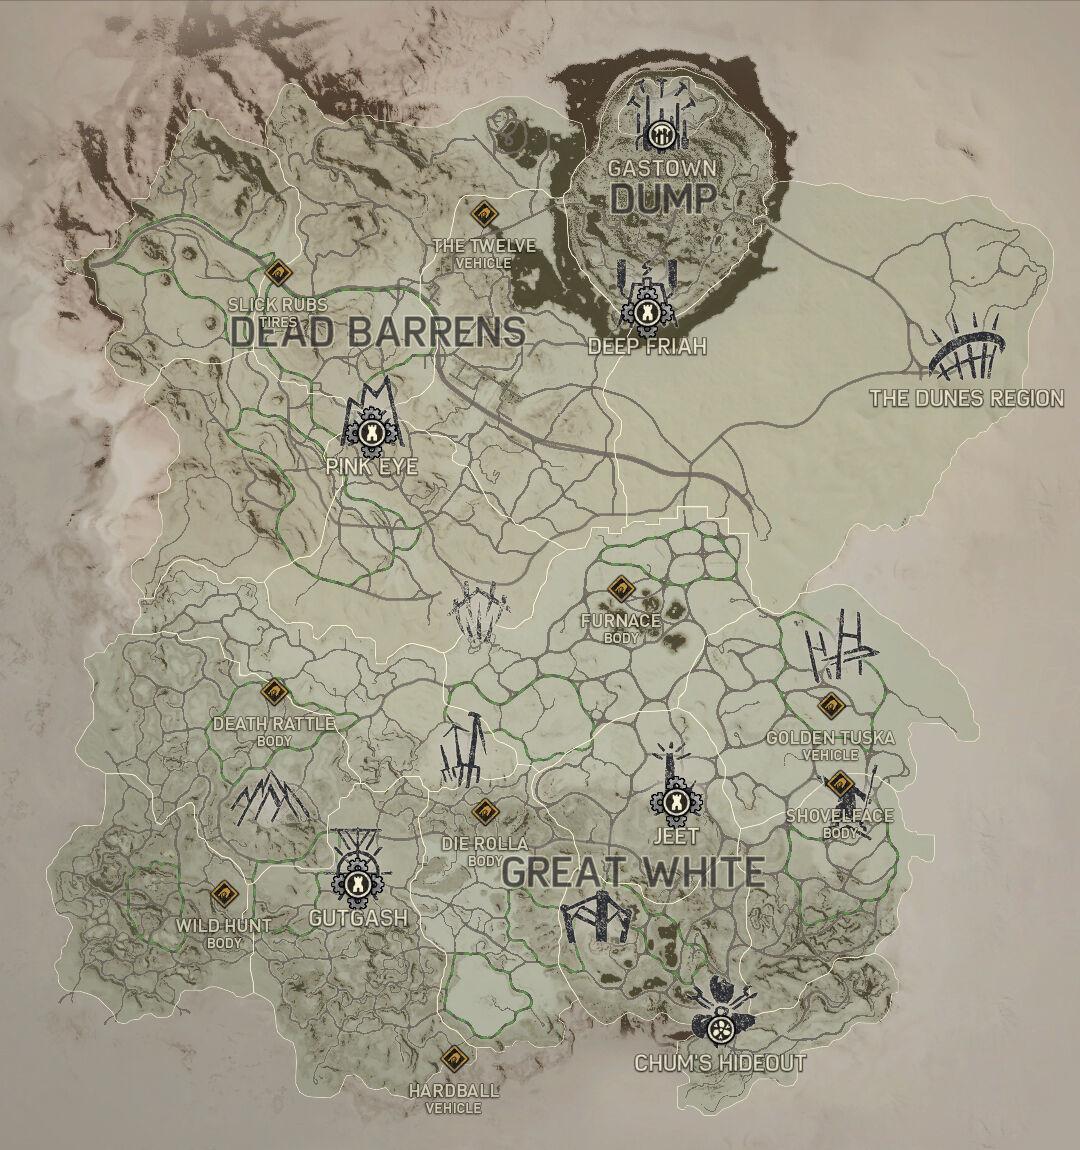 Rare Vehicles Map.jpg